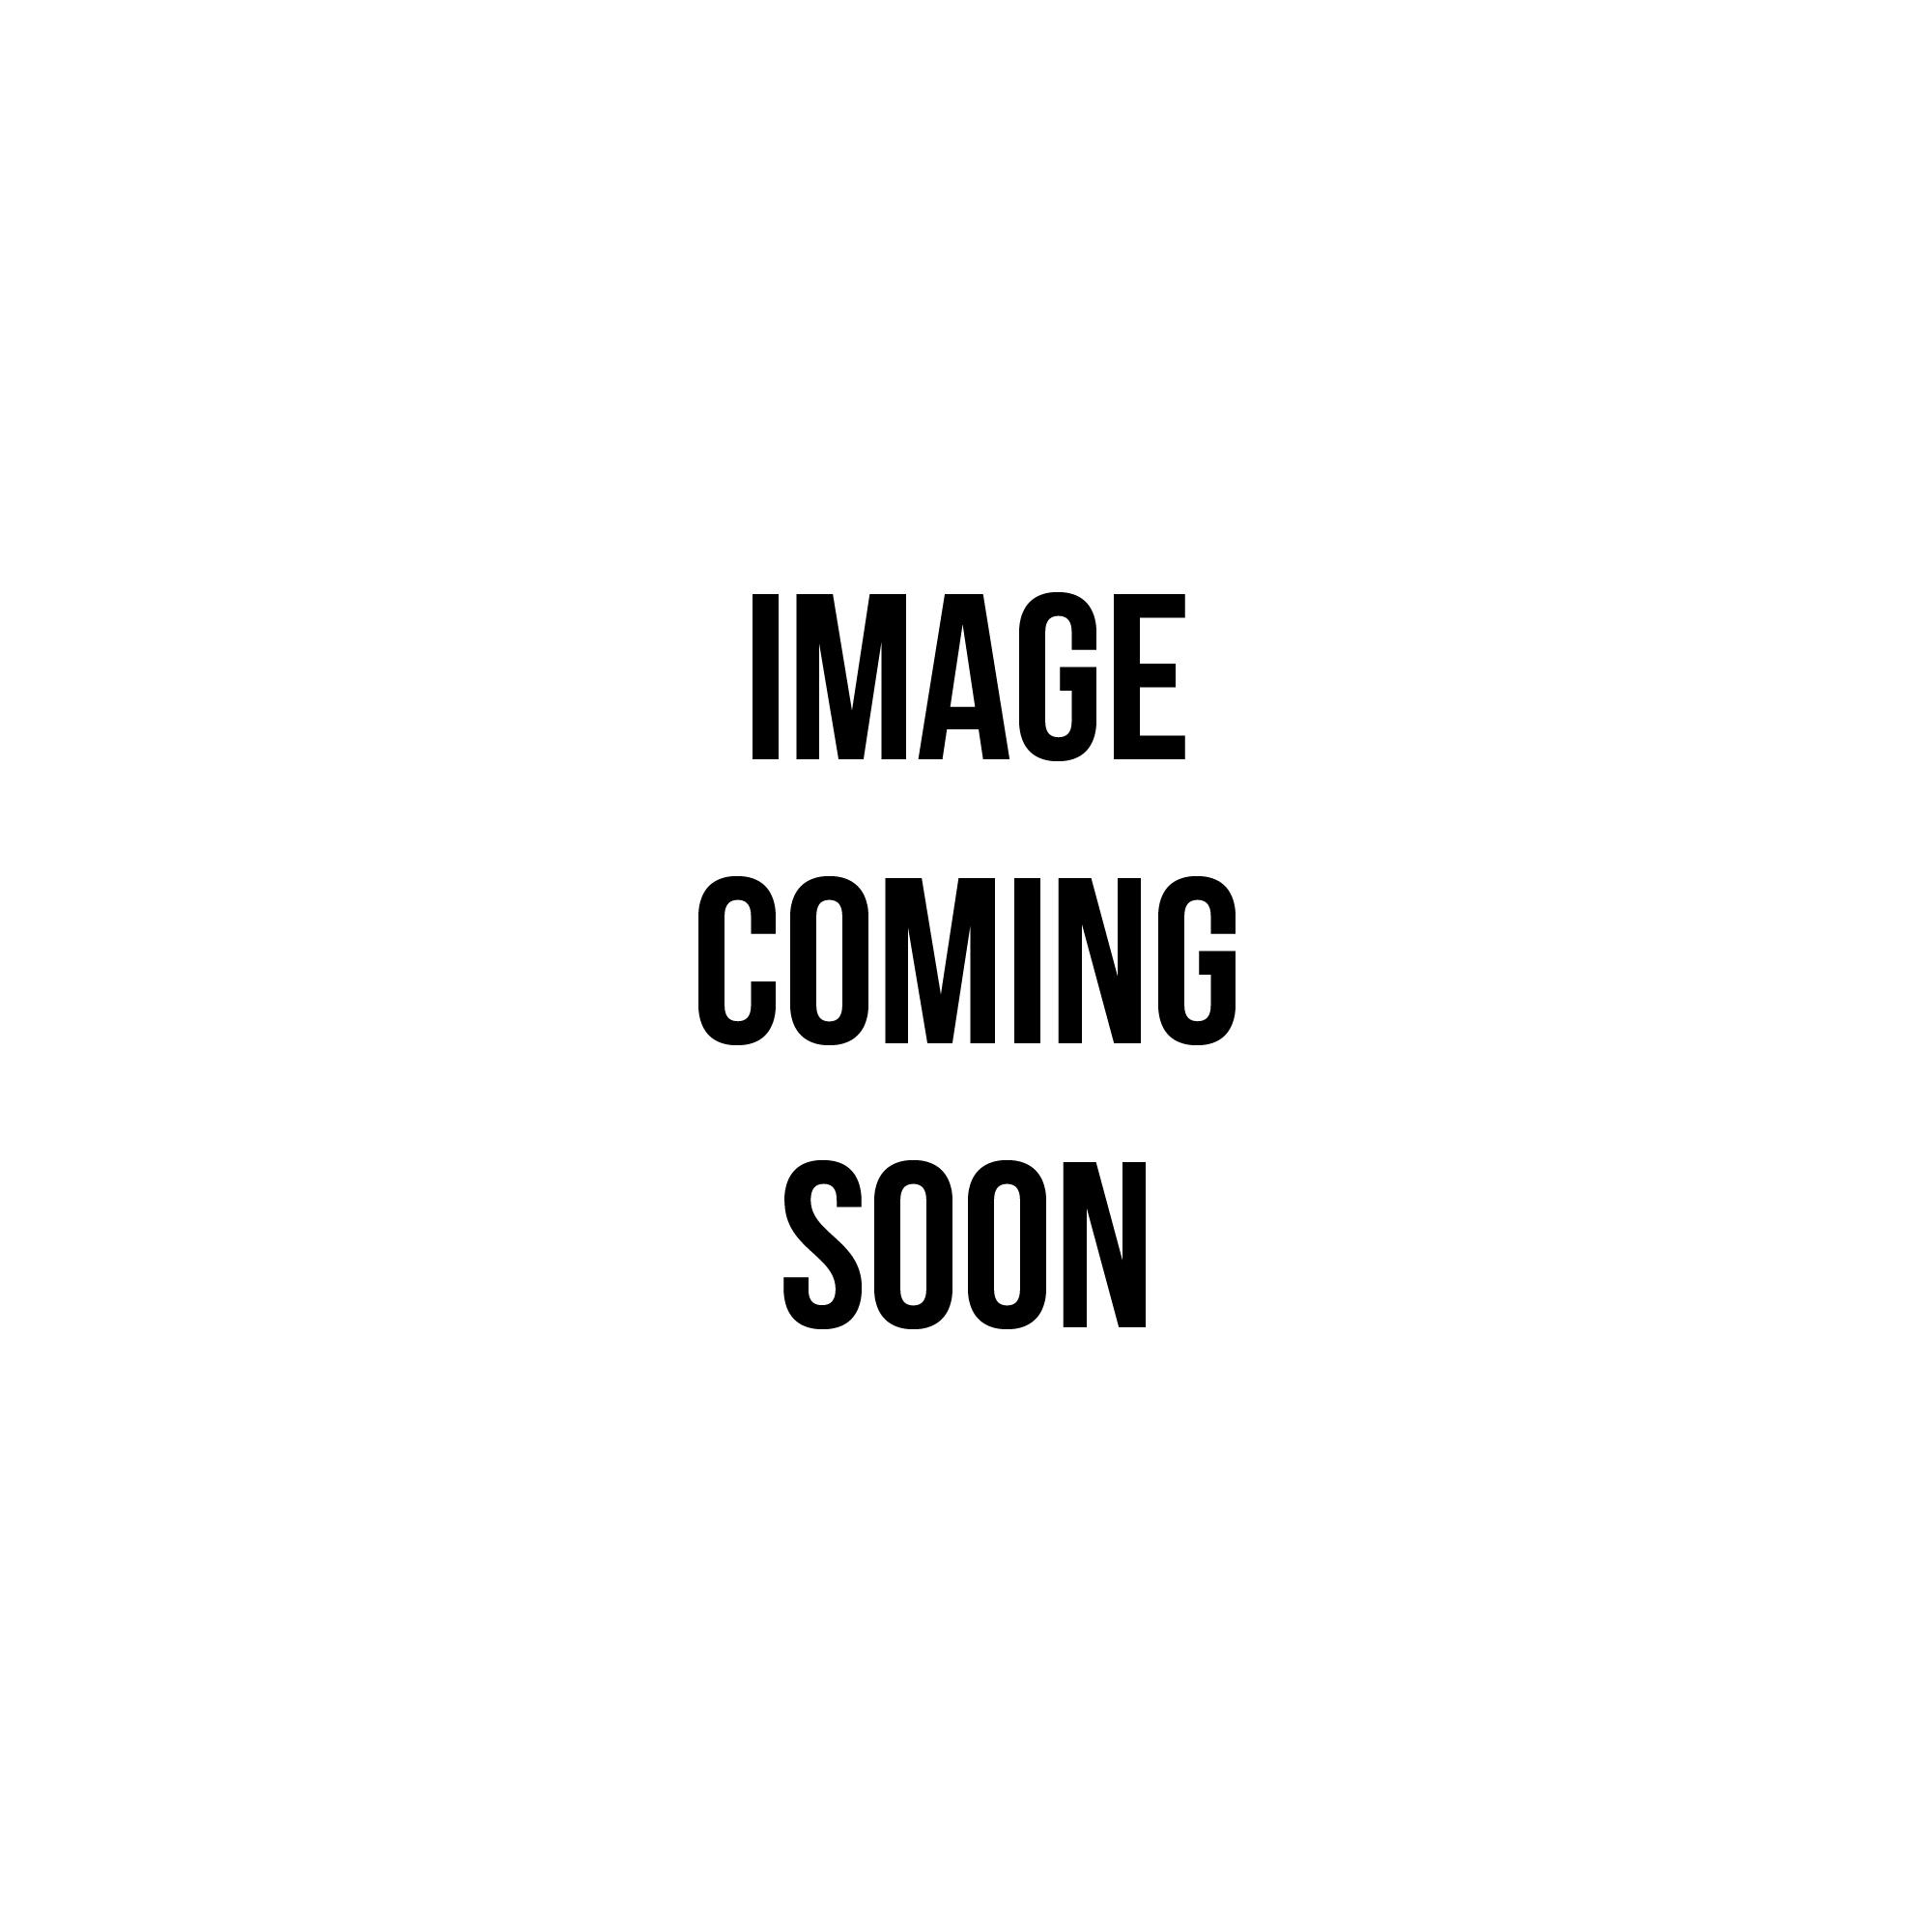 Nike Zoom Air Pegasus 34 Para Mujer Camisa Púrpura ofertas de descuento 0bCy3L